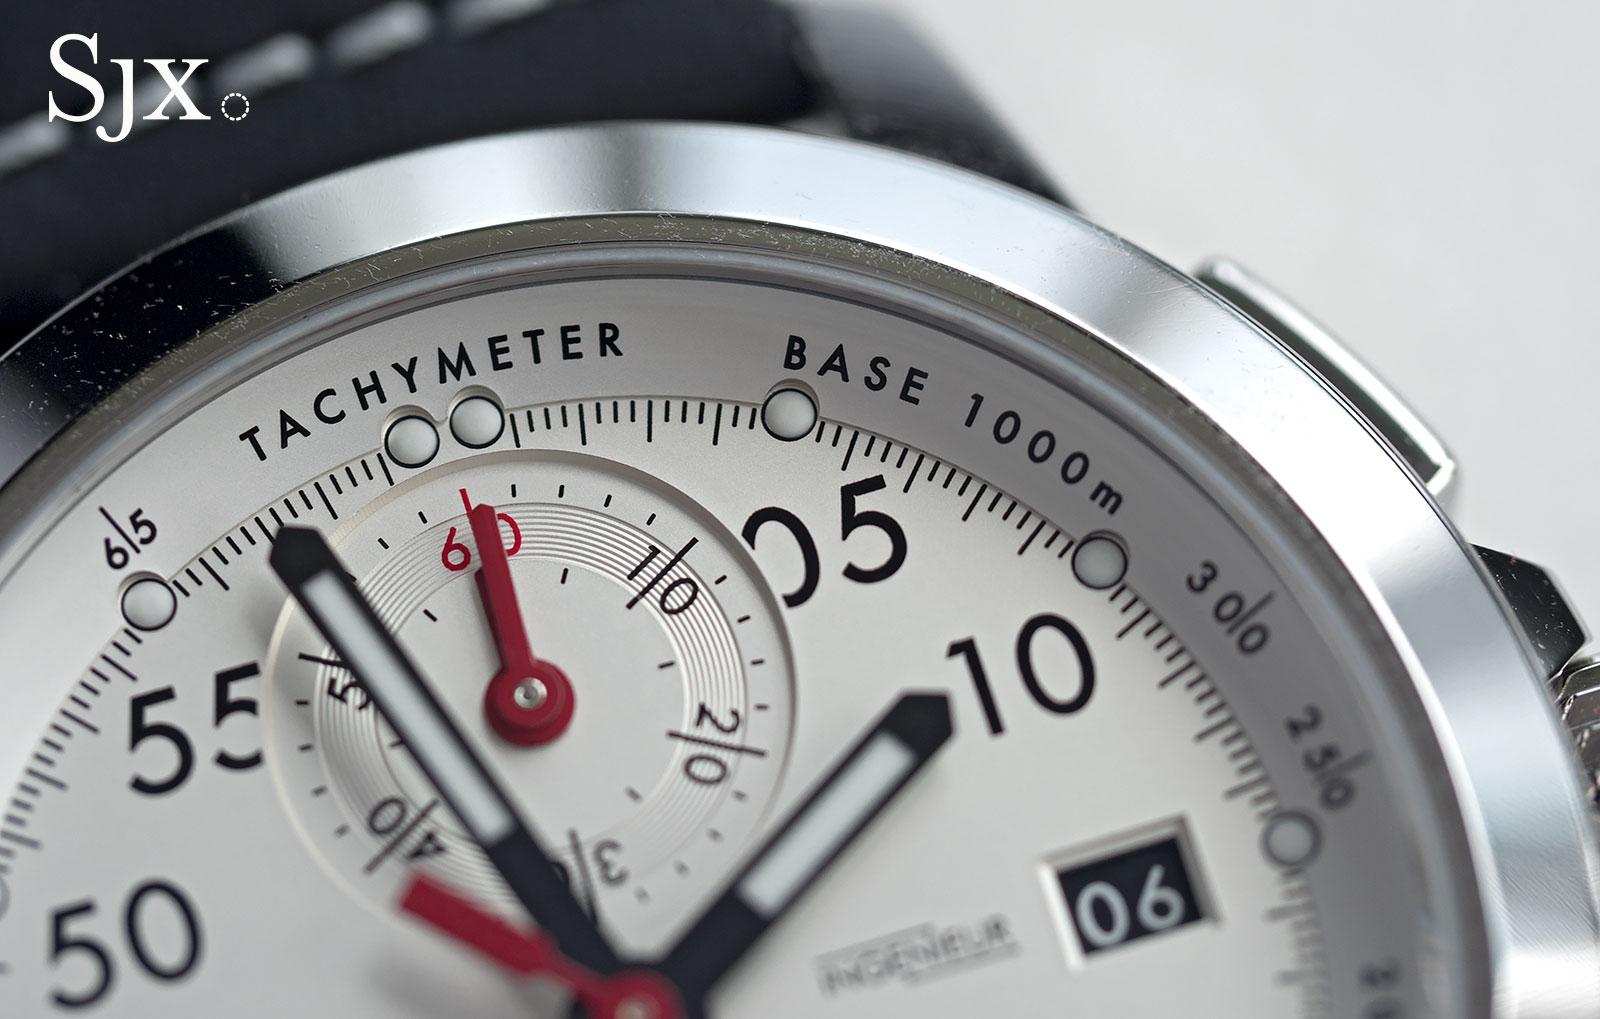 IWC Ingenieur Chronograph 50th Anniversary AMG 5